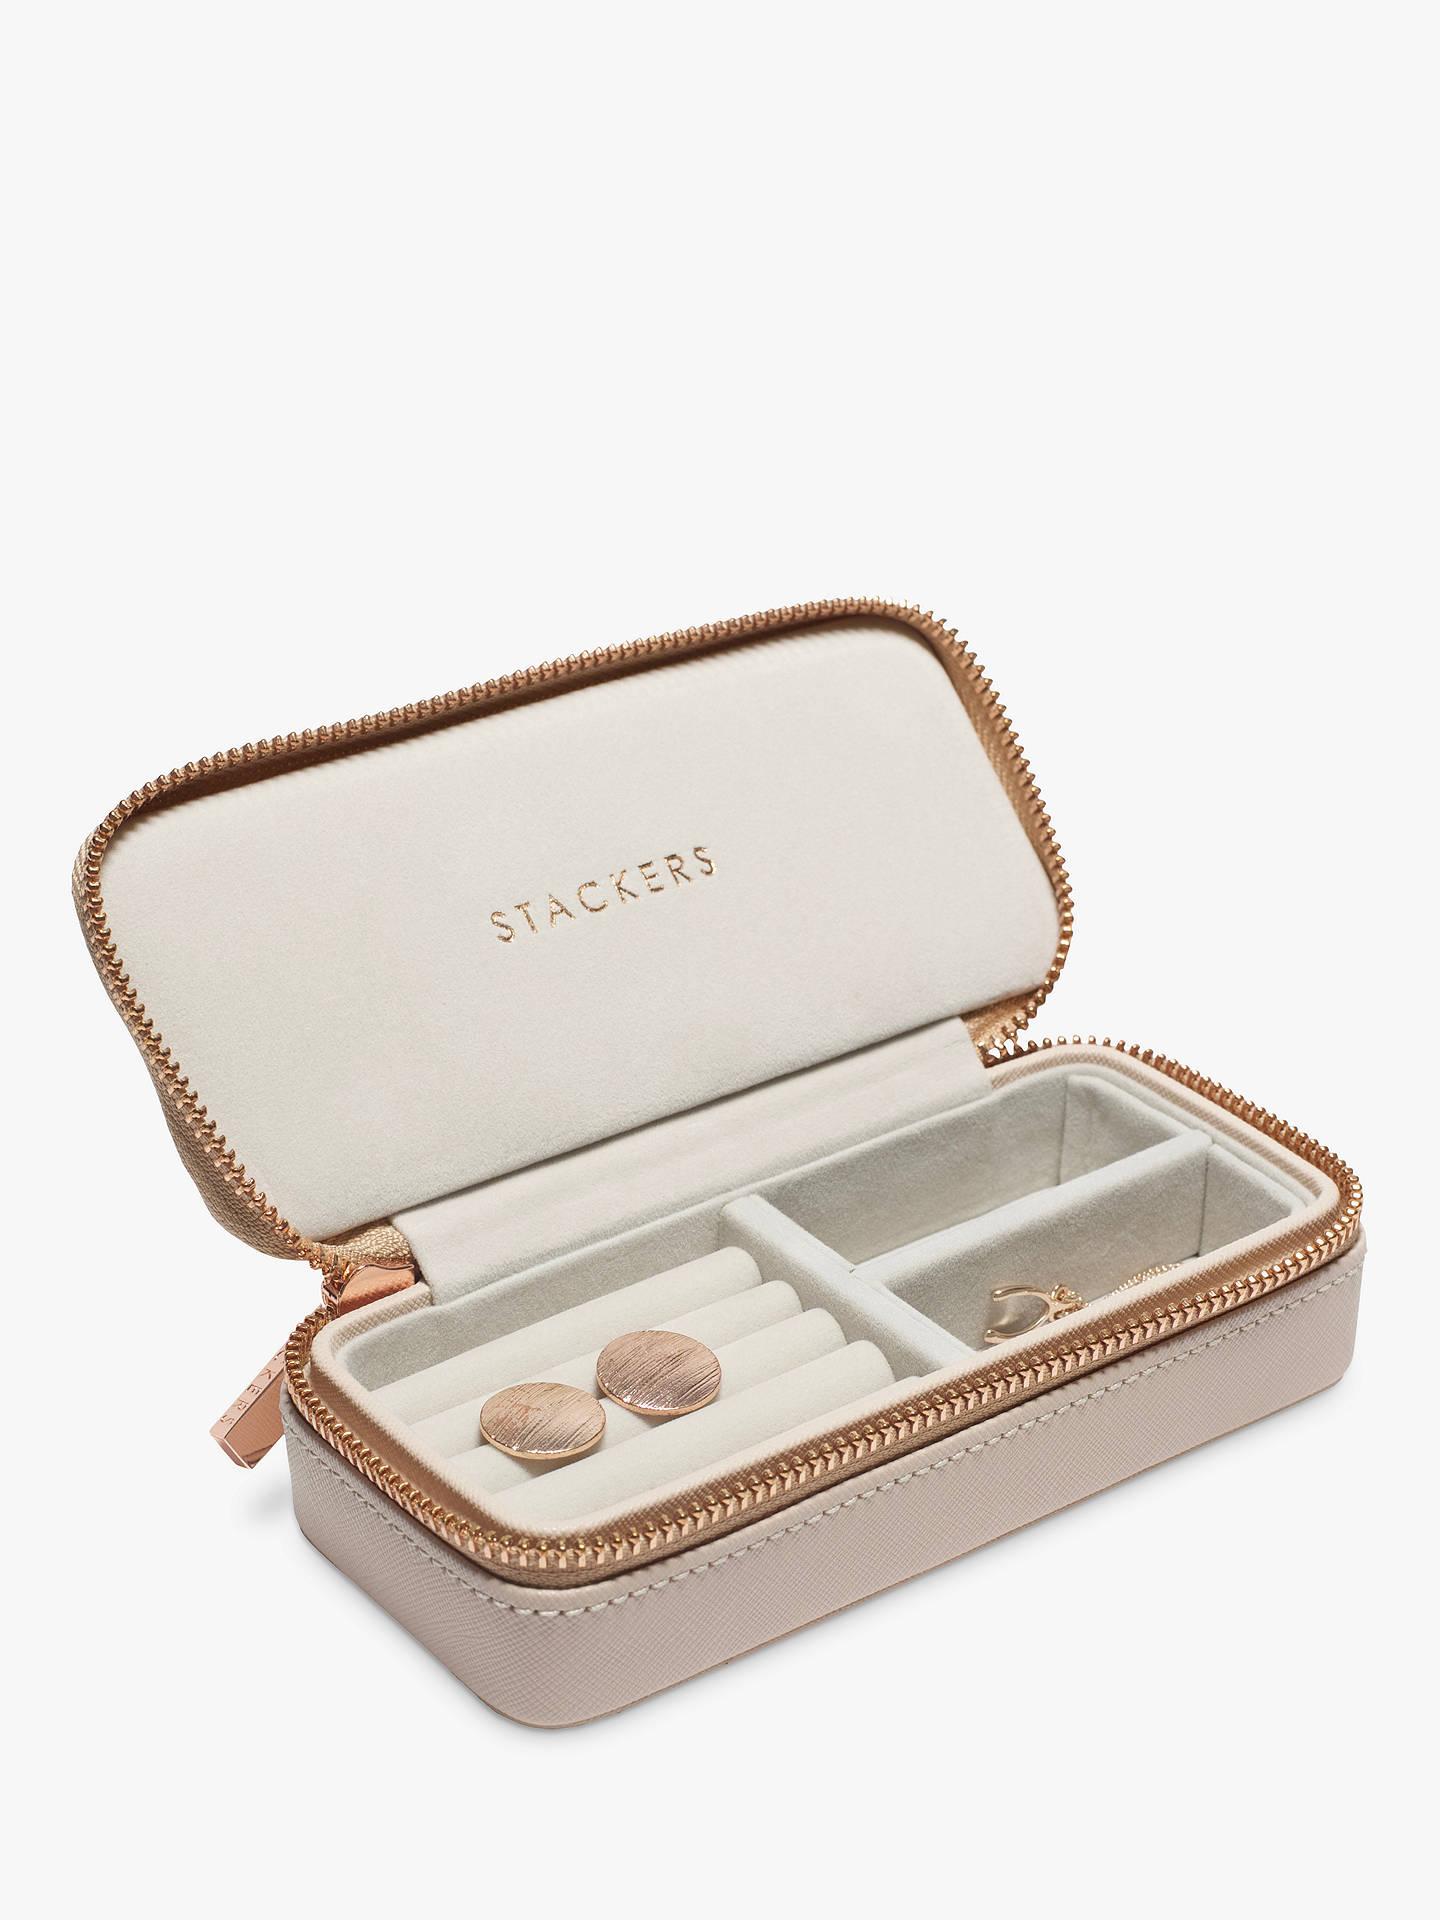 Stackers Overnight Travel Jewellery Box Blush Pink